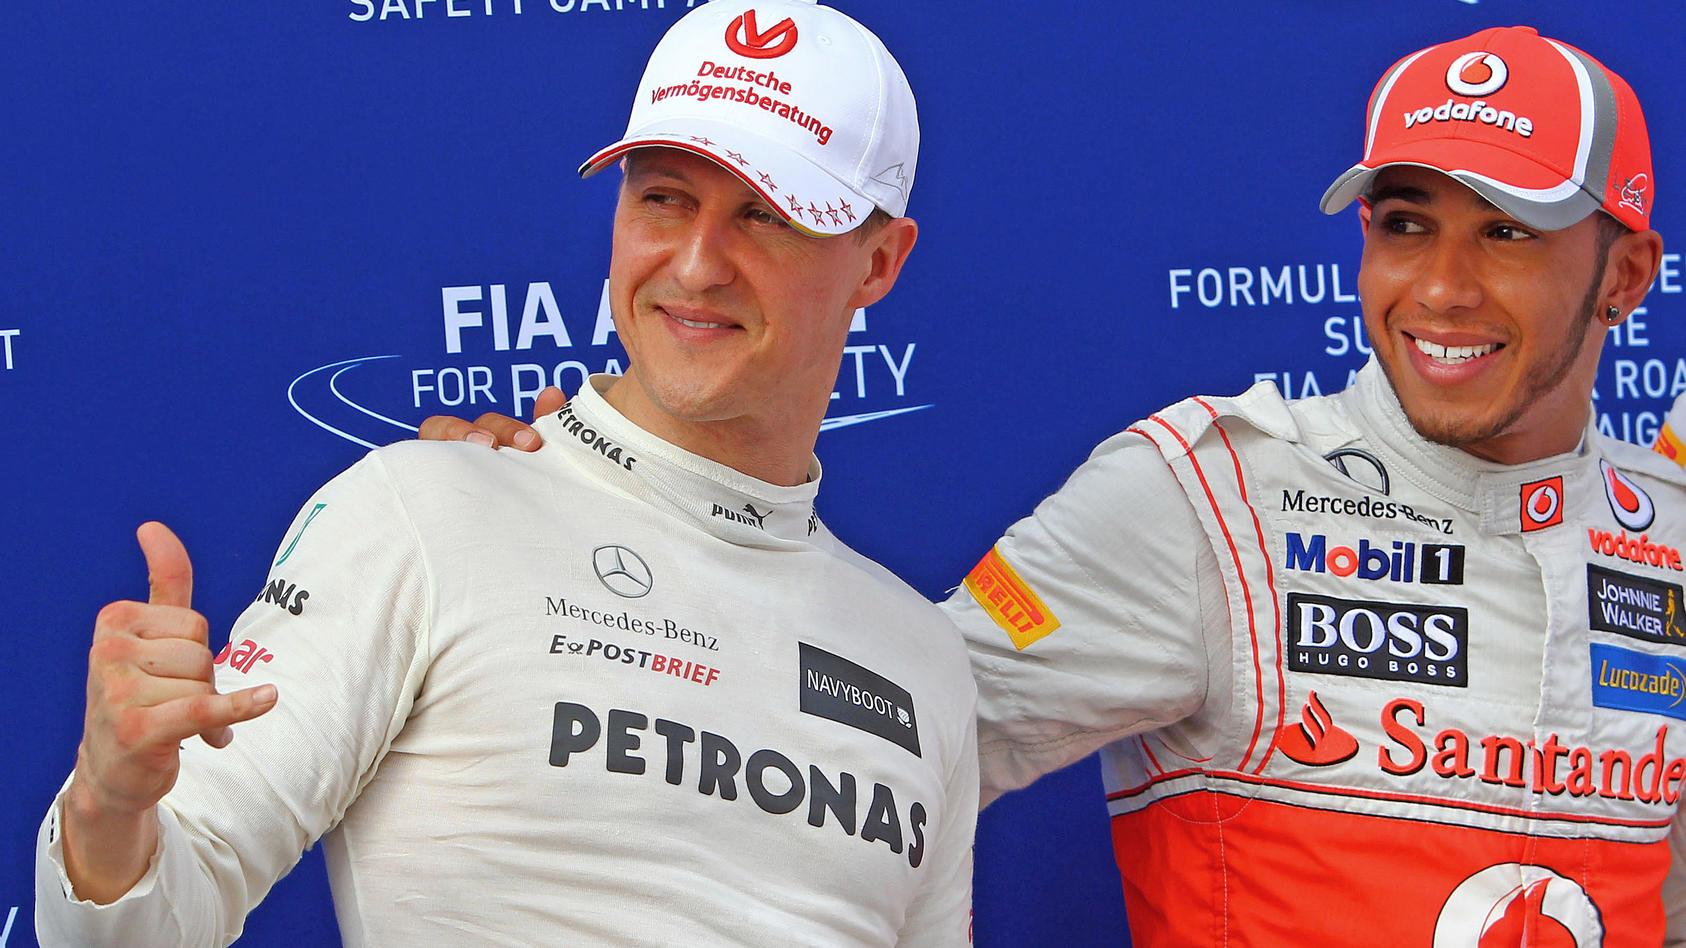 Themenpaket Formel 1